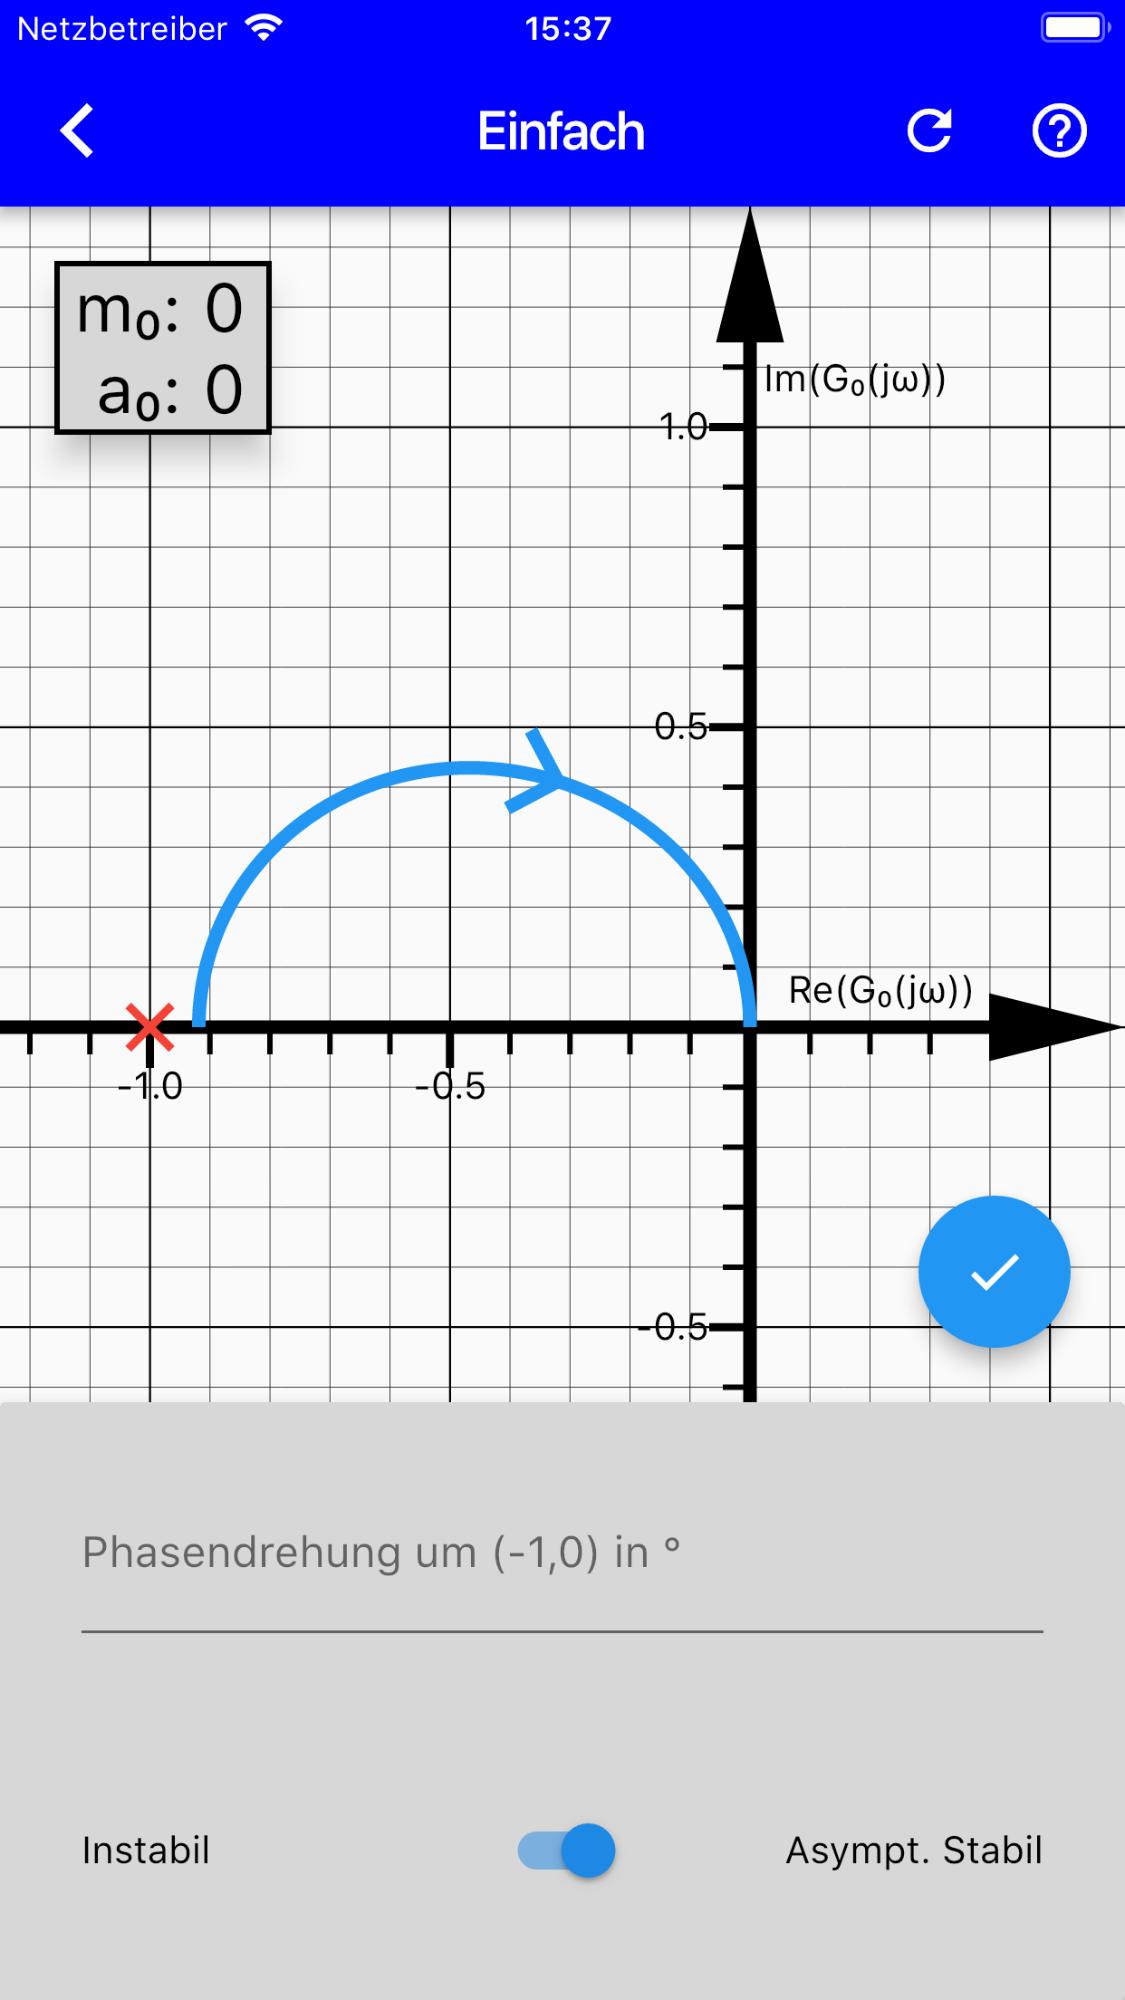 https://opencms.uni-stuttgart.de/fak7/ist/teaching/elearning/figures_eLearning/Screen_Shot_Nyquist.png